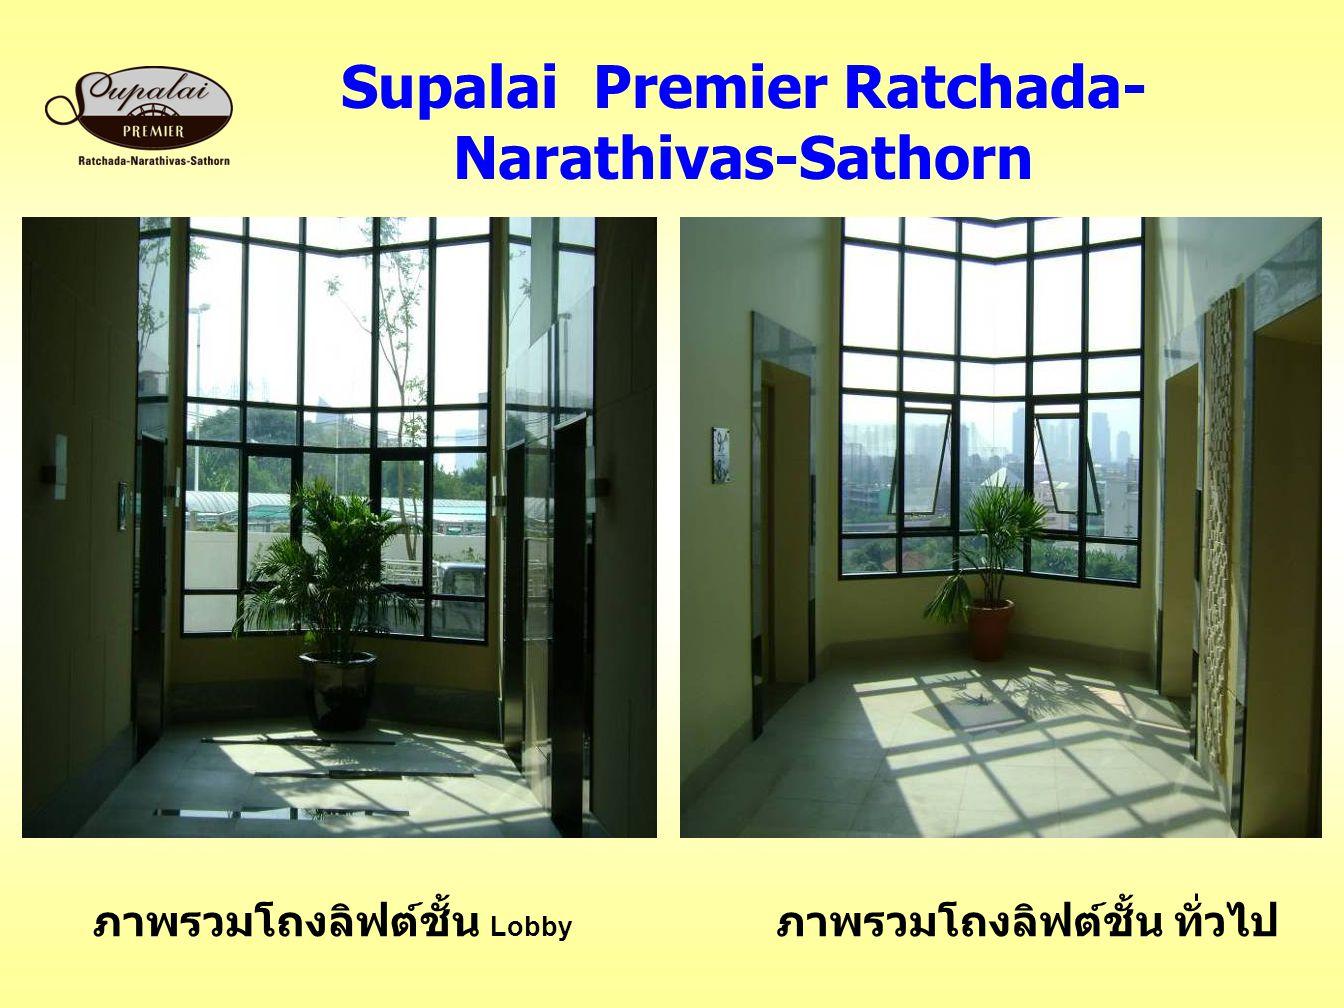 Supalai Premier Ratchada- Narathivas-Sathorn ภาพรวมโถงลิฟต์ชั้น Lobby ภาพรวมโถงลิฟต์ชั้น ทั่วไป